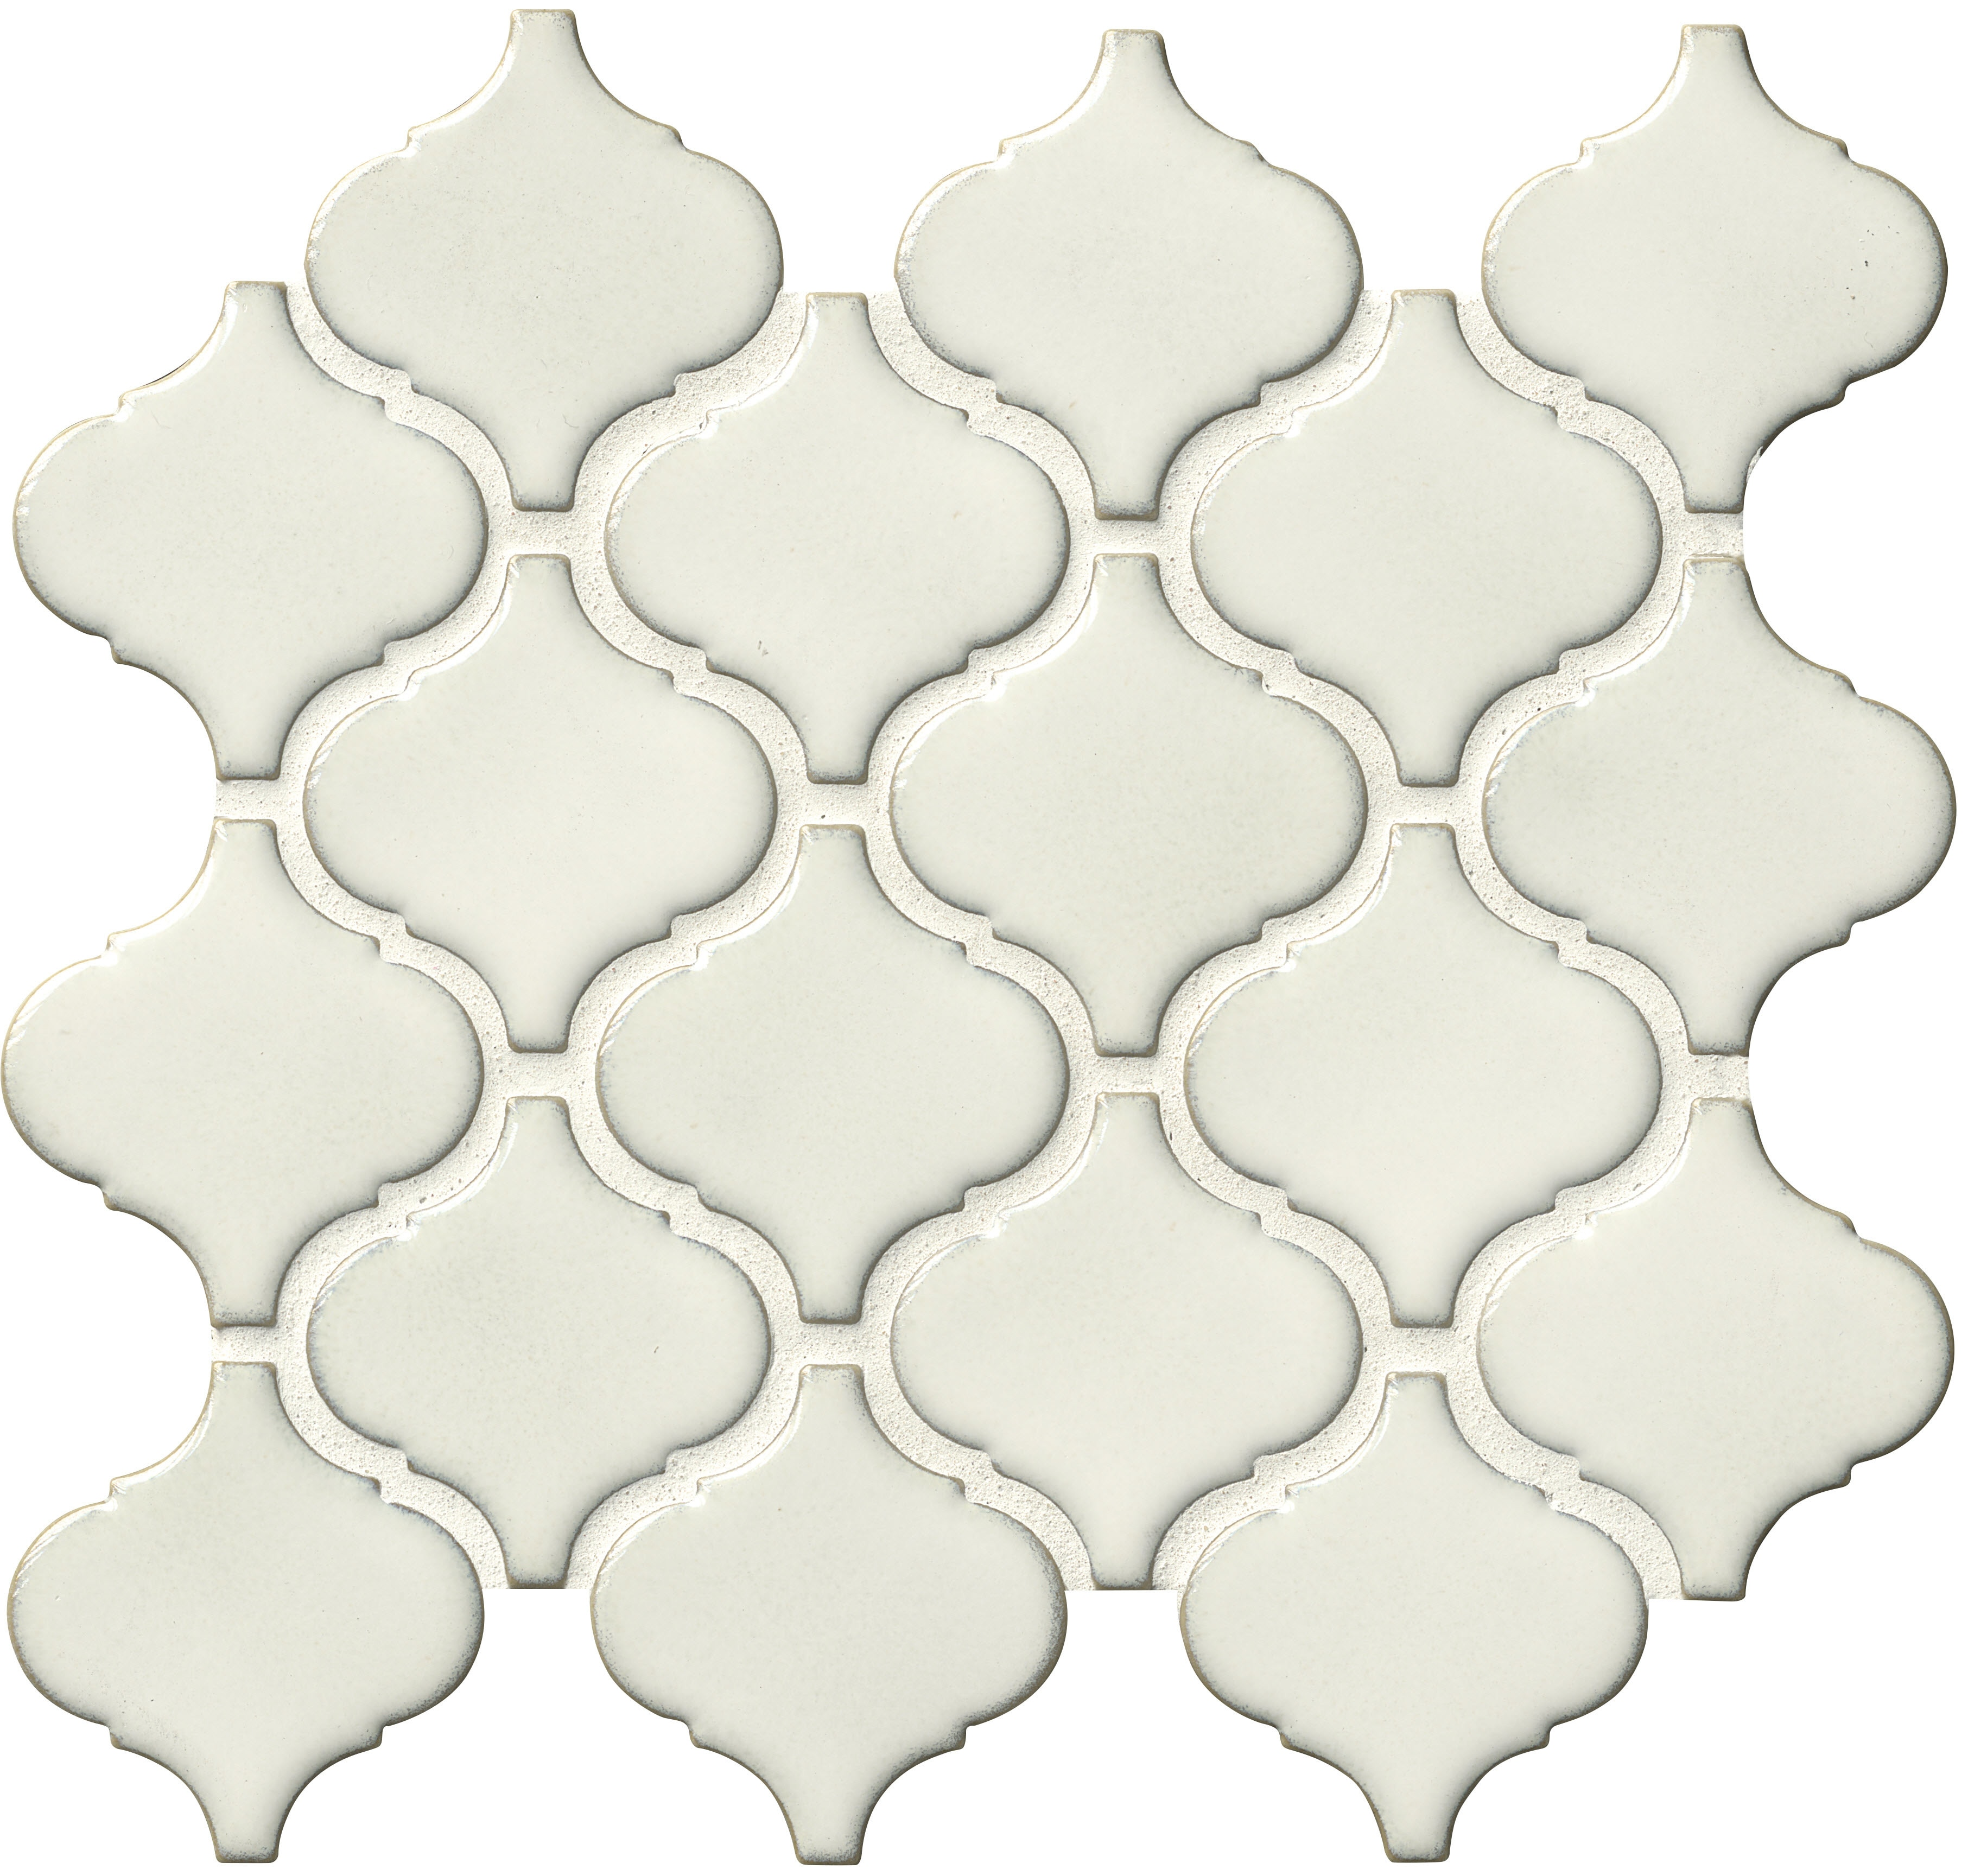 Arabesque 6mm / Pattern / Glossy Ceramic Tile - Bianco 0